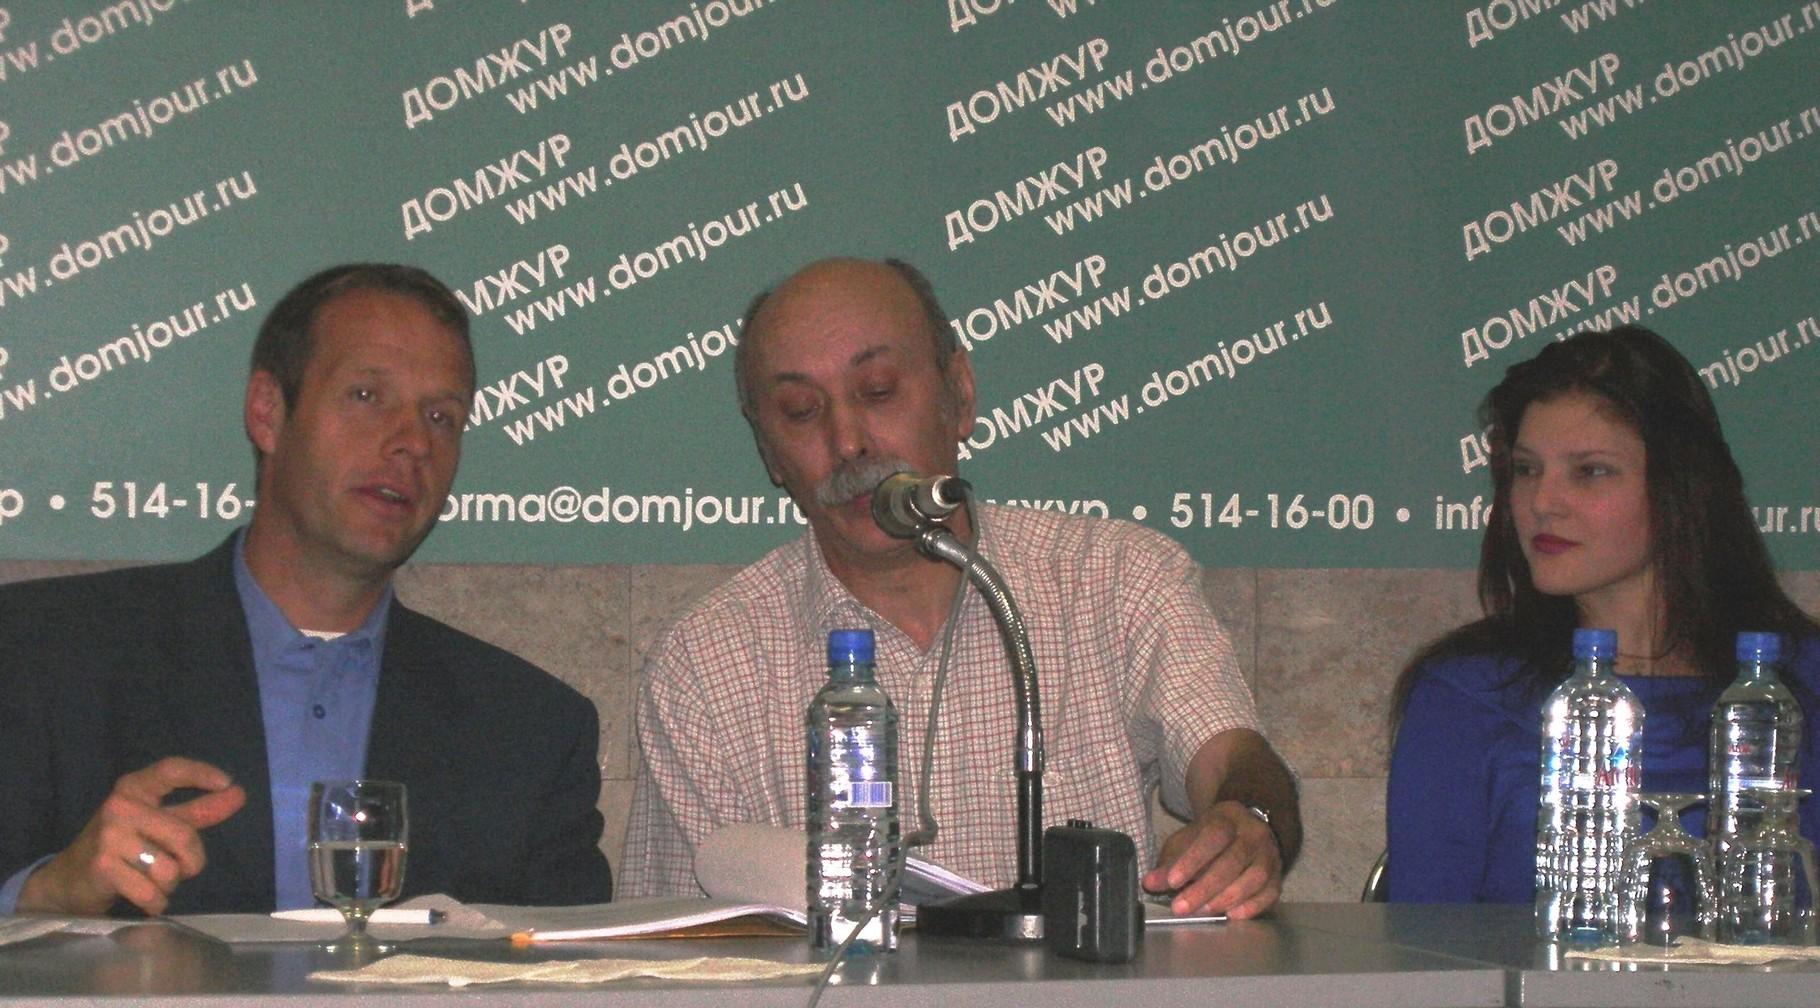 Pressekonferenz in Moskau mit Boris Chlebnikov